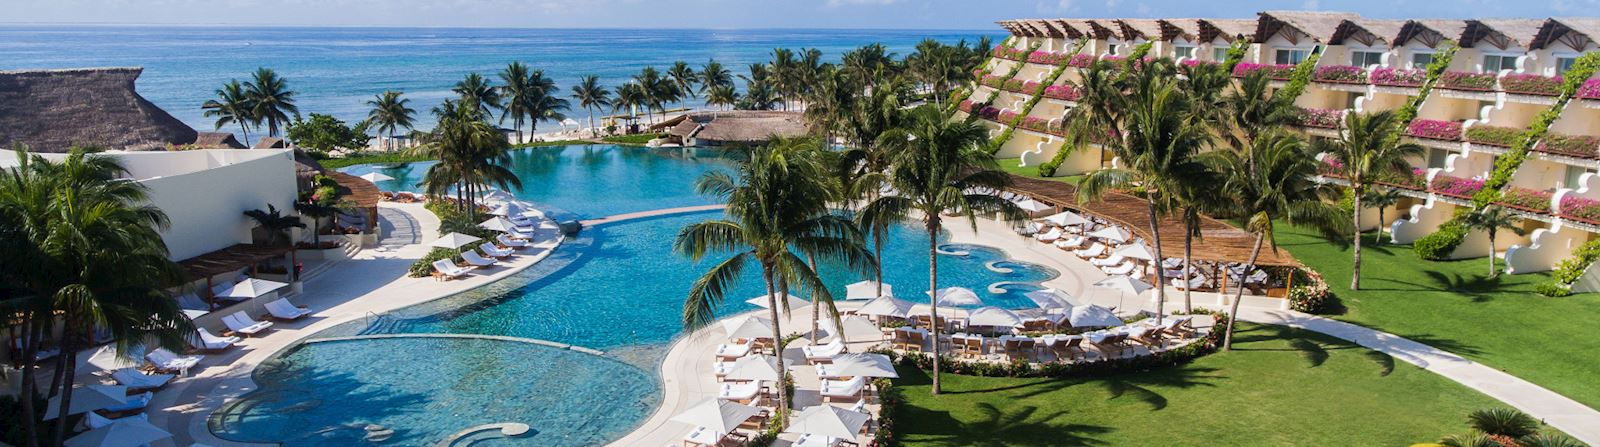 Destinations of Grand Velas Riviera Maya Mexico